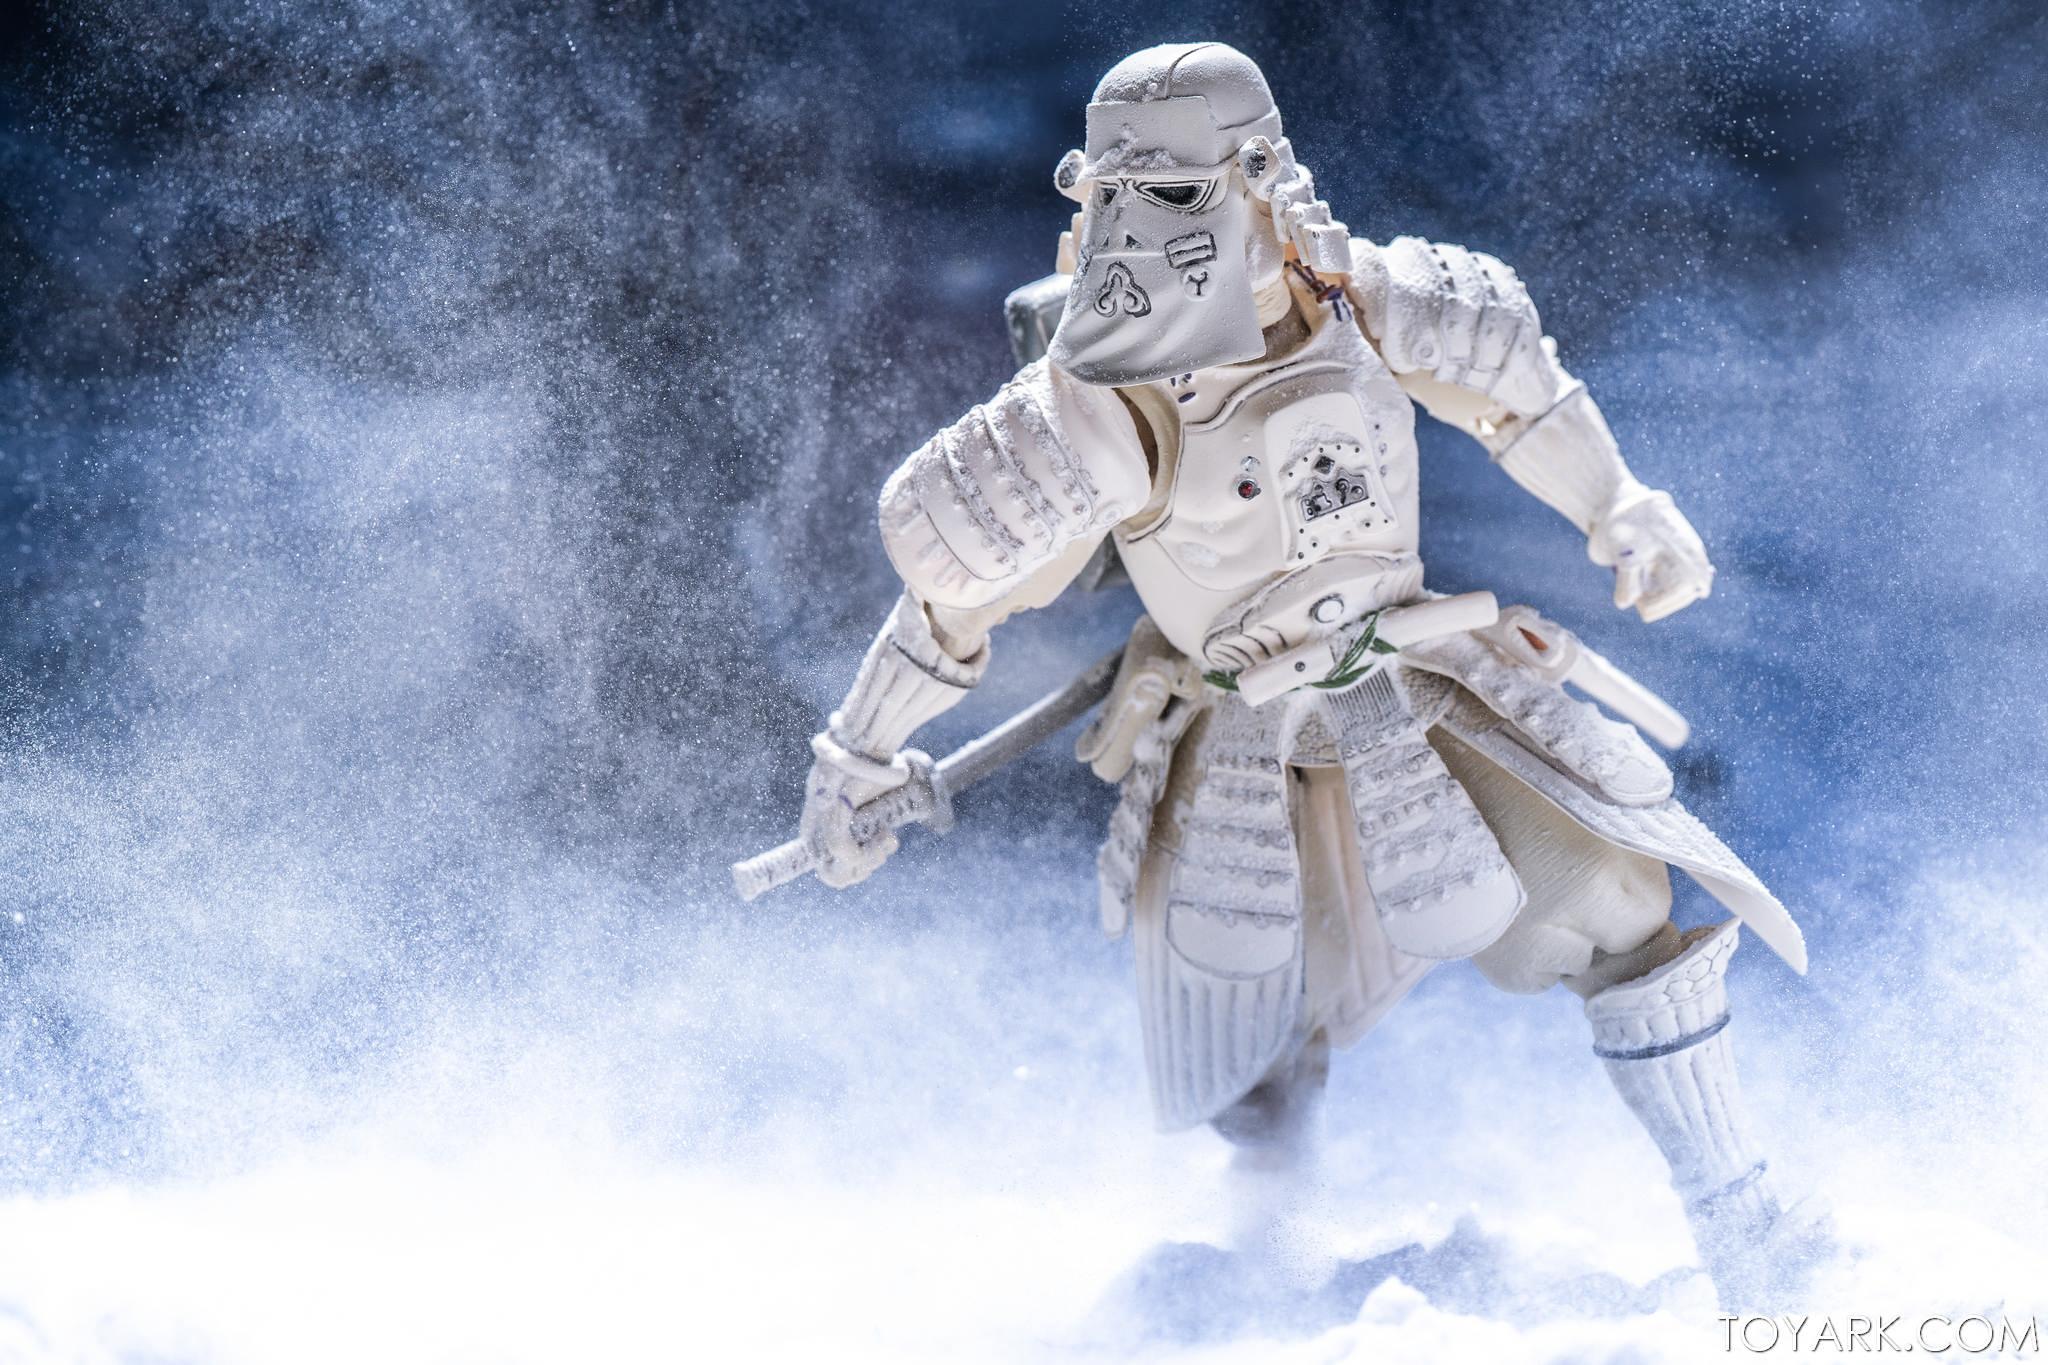 STAR WARS Movie Realization - KANREICHI ASHIGARU SNOWTROOPER Realization-Snowtrooper-41